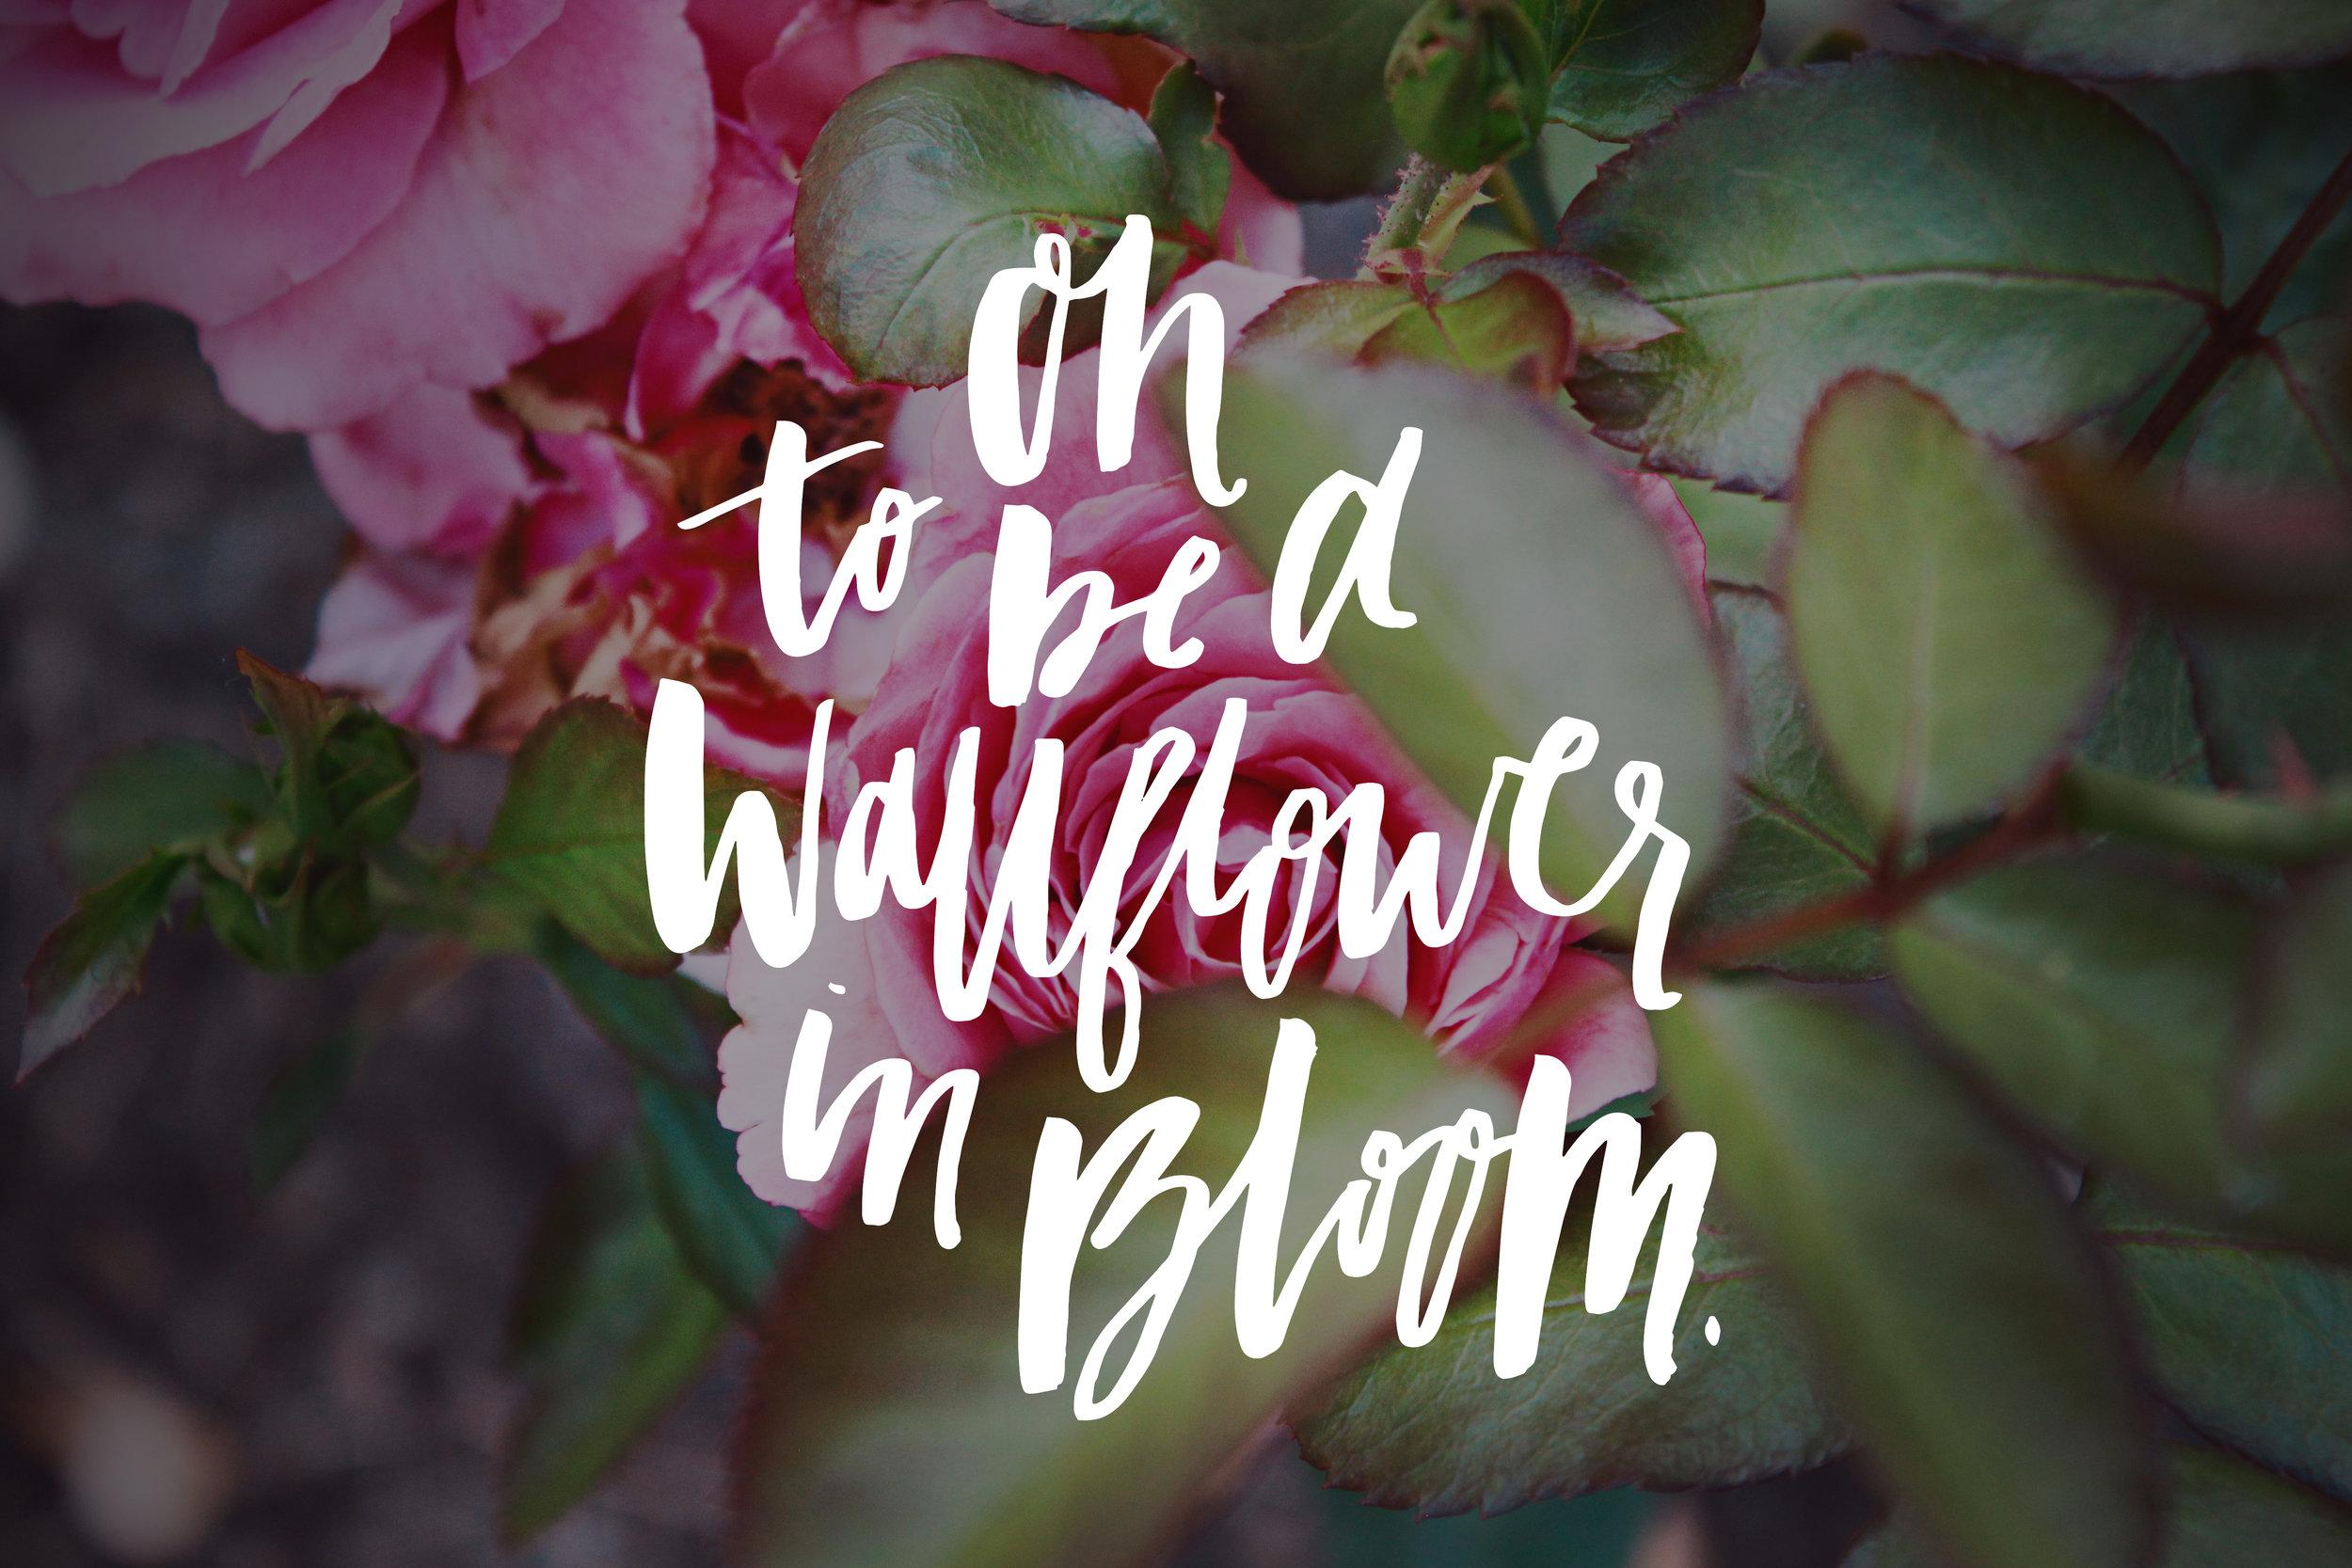 a_msprint_wallflowerbloom3.jpg